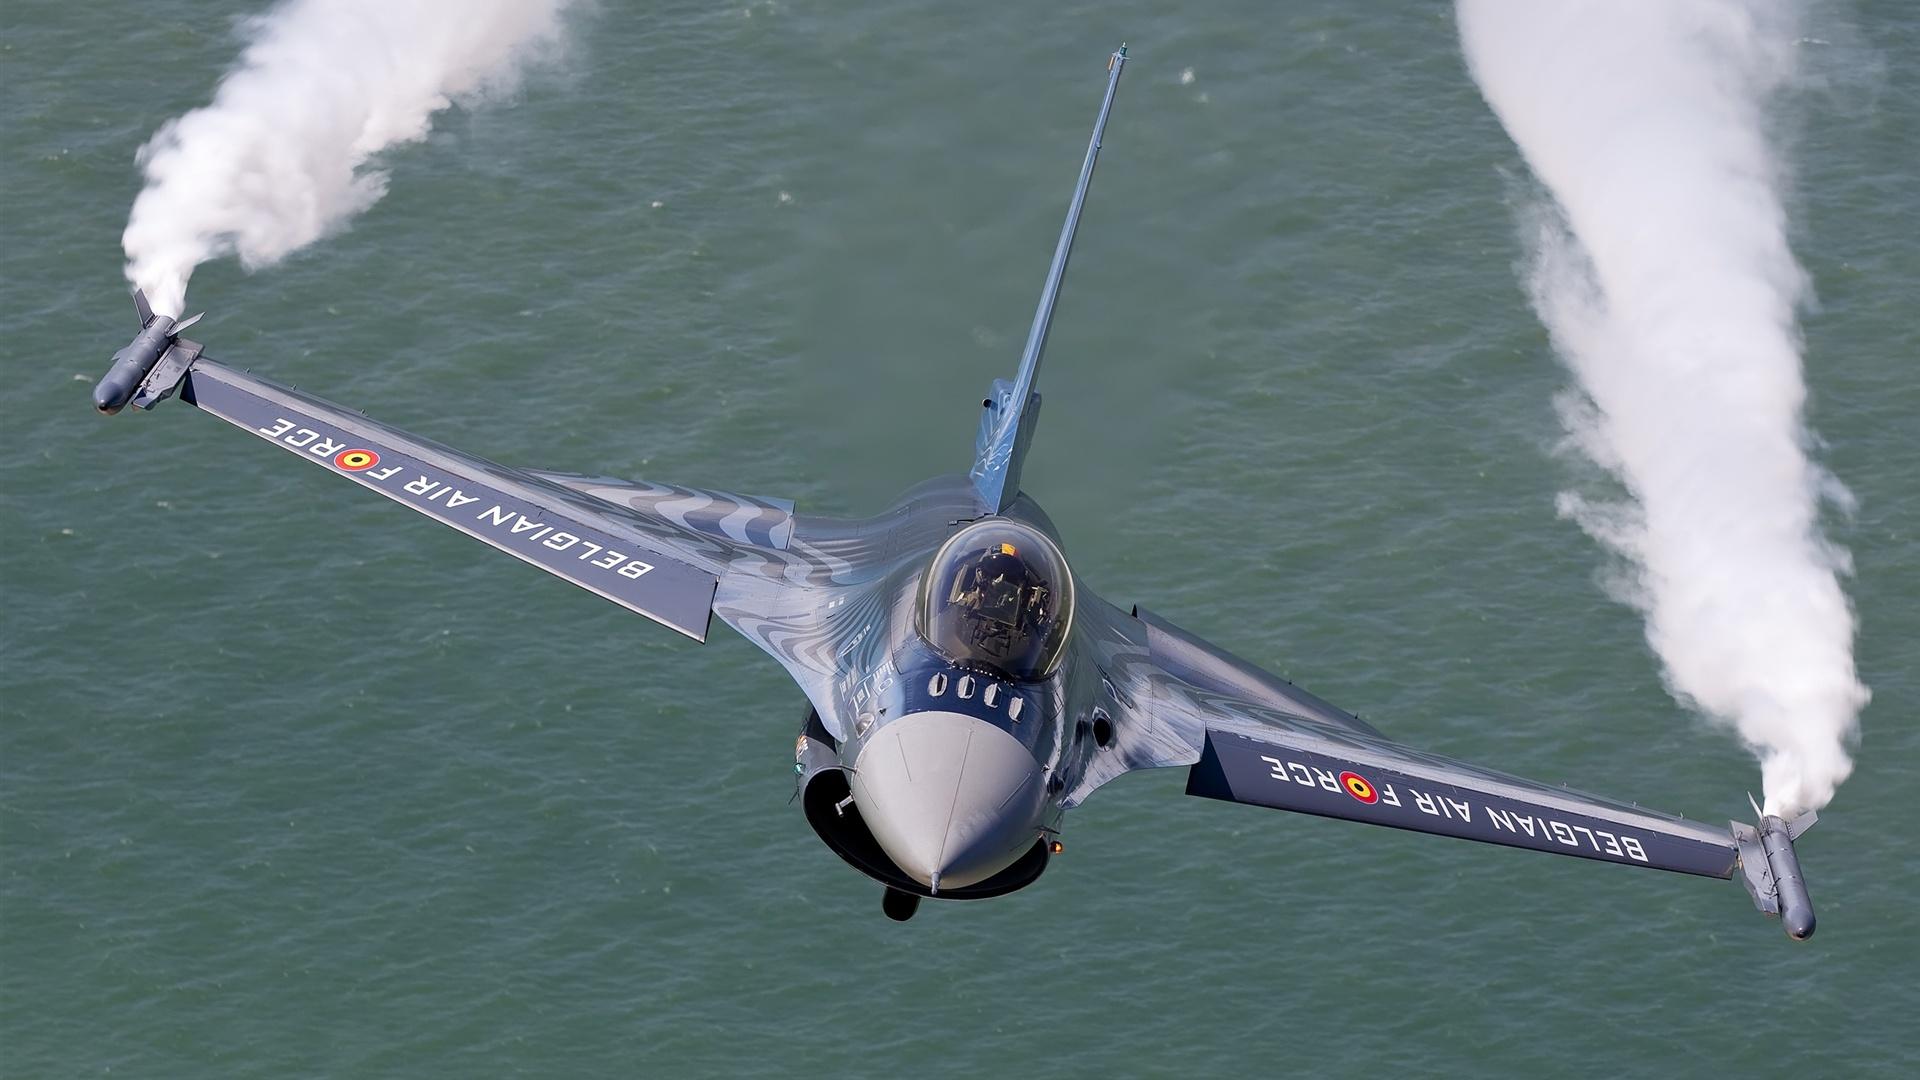 F 16 (戦闘機)の画像 p1_36